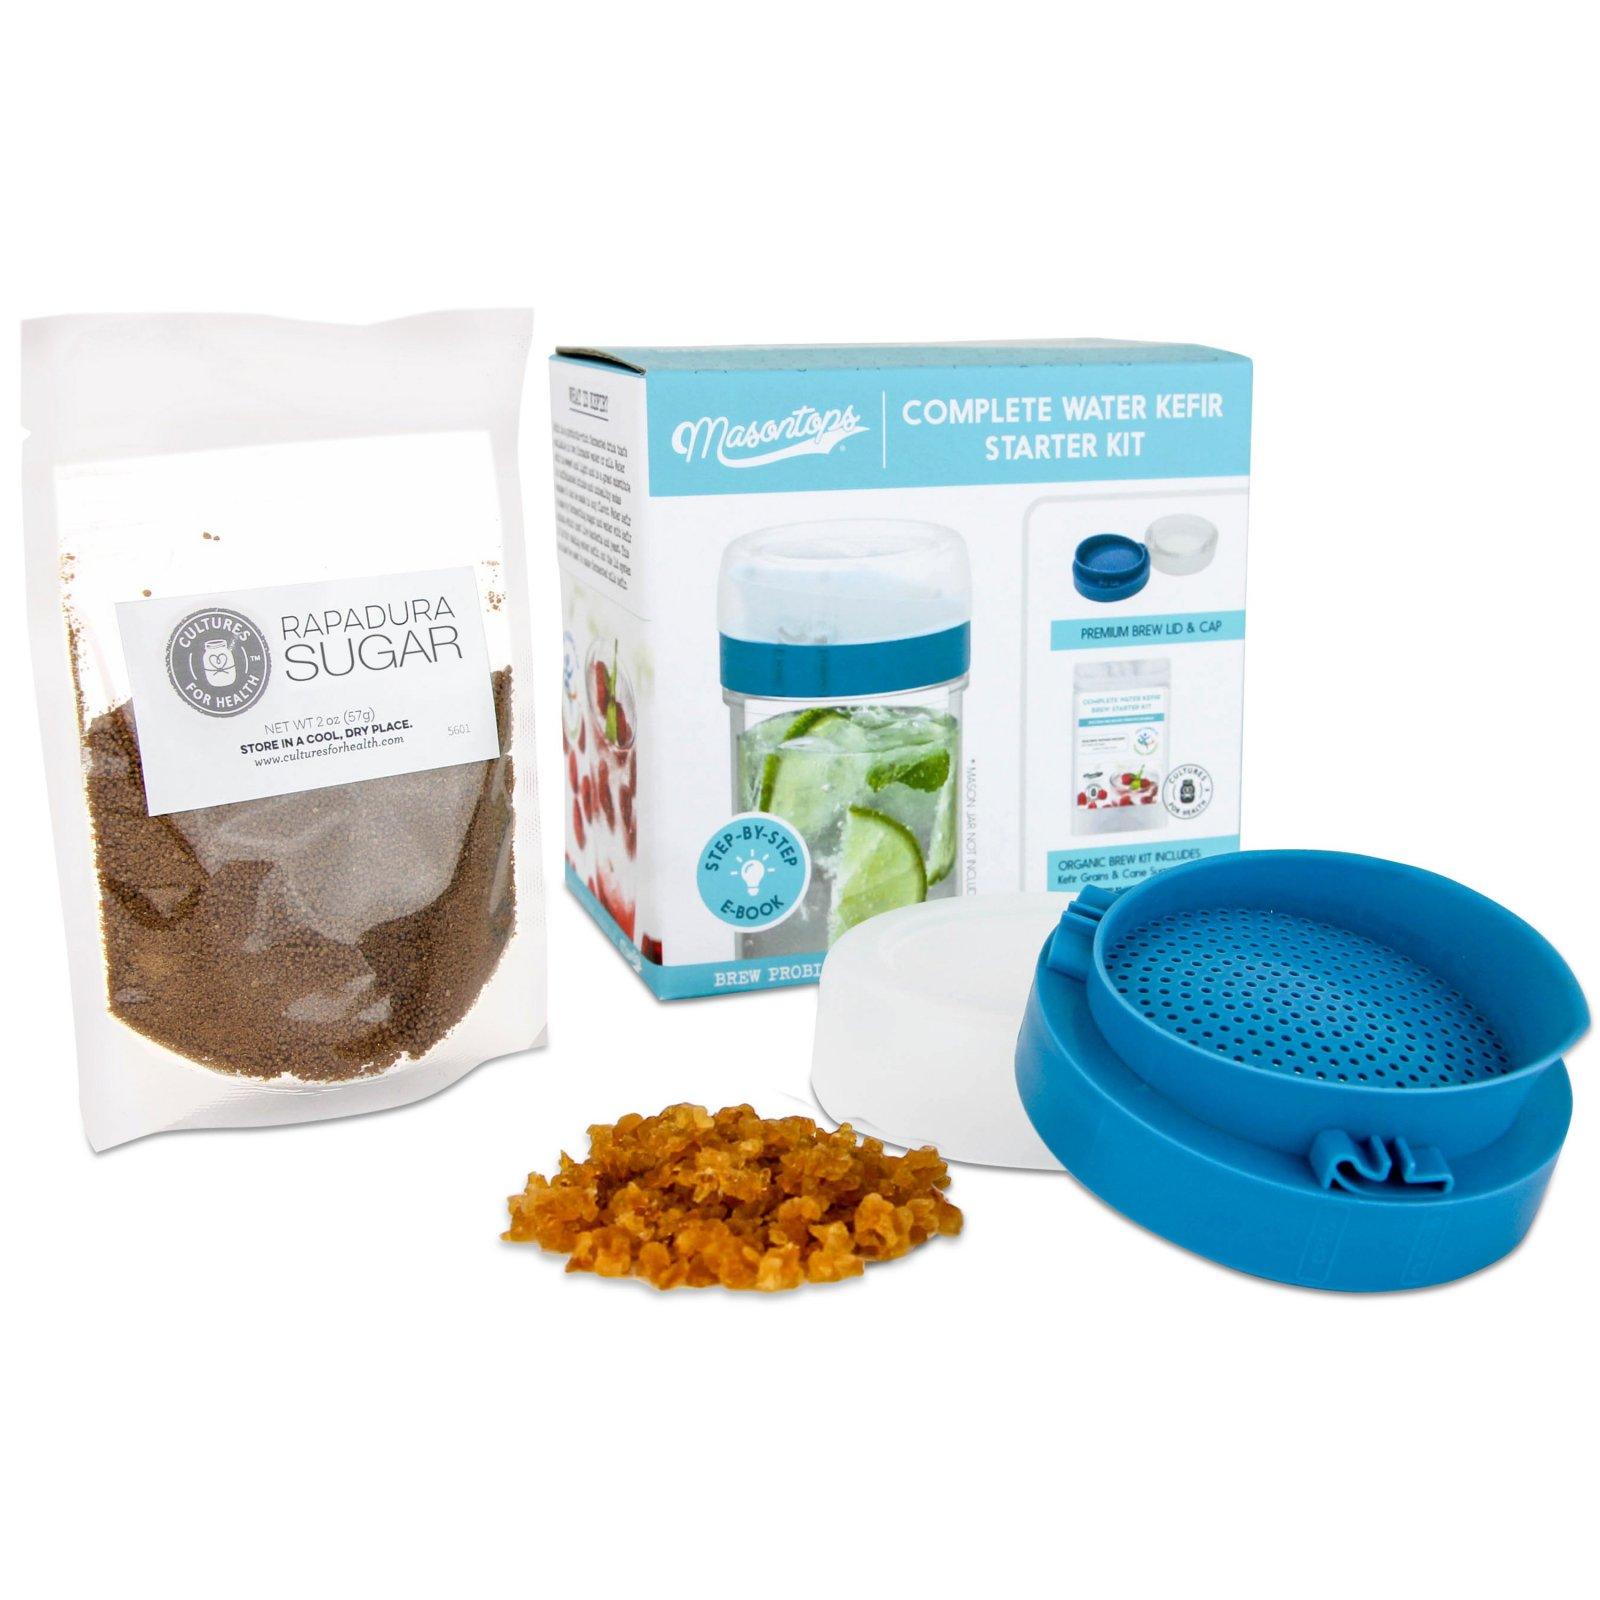 Complete Water Kefir Starter Kit